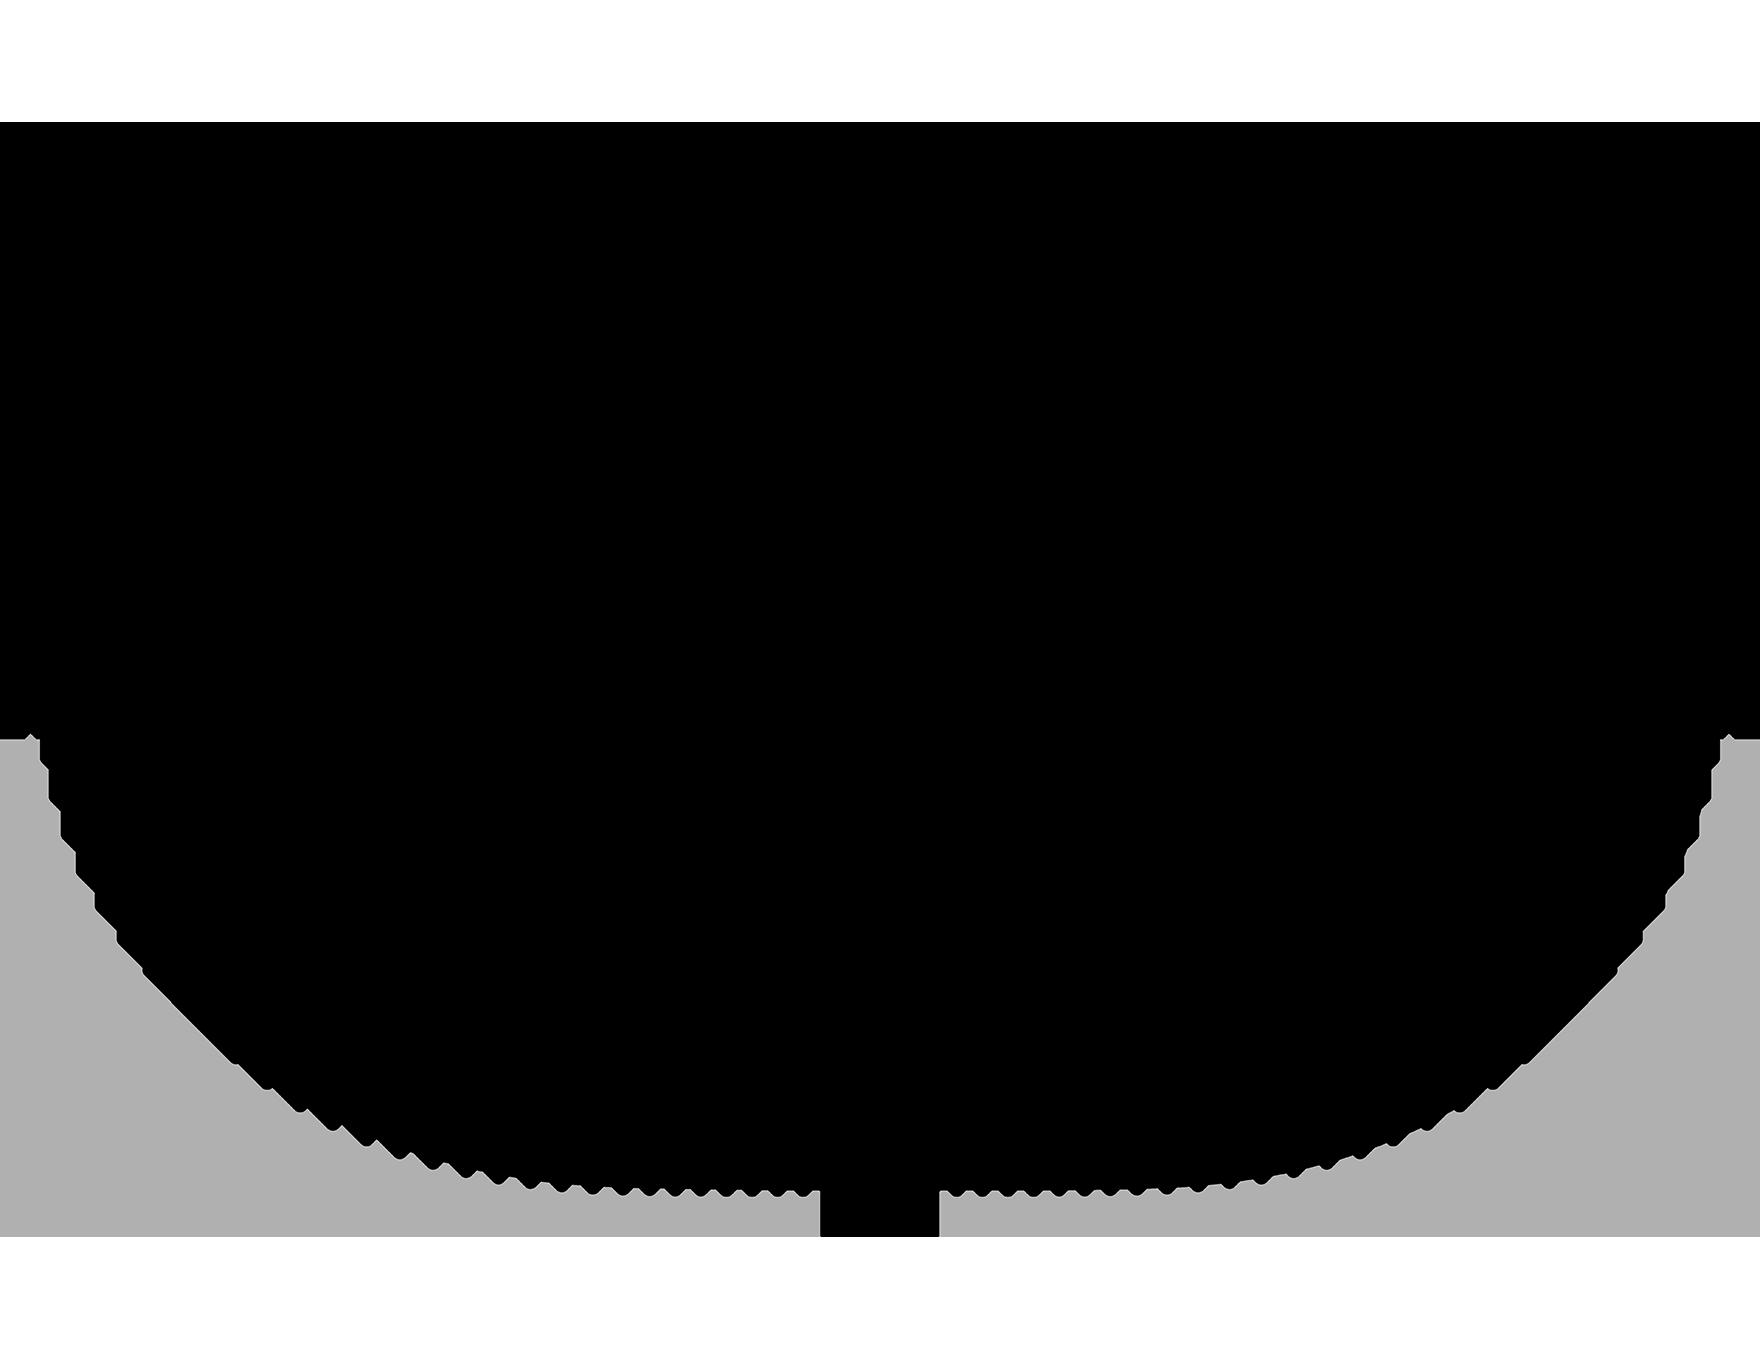 Velodrome Design Expertise Track Geometry Diagram L